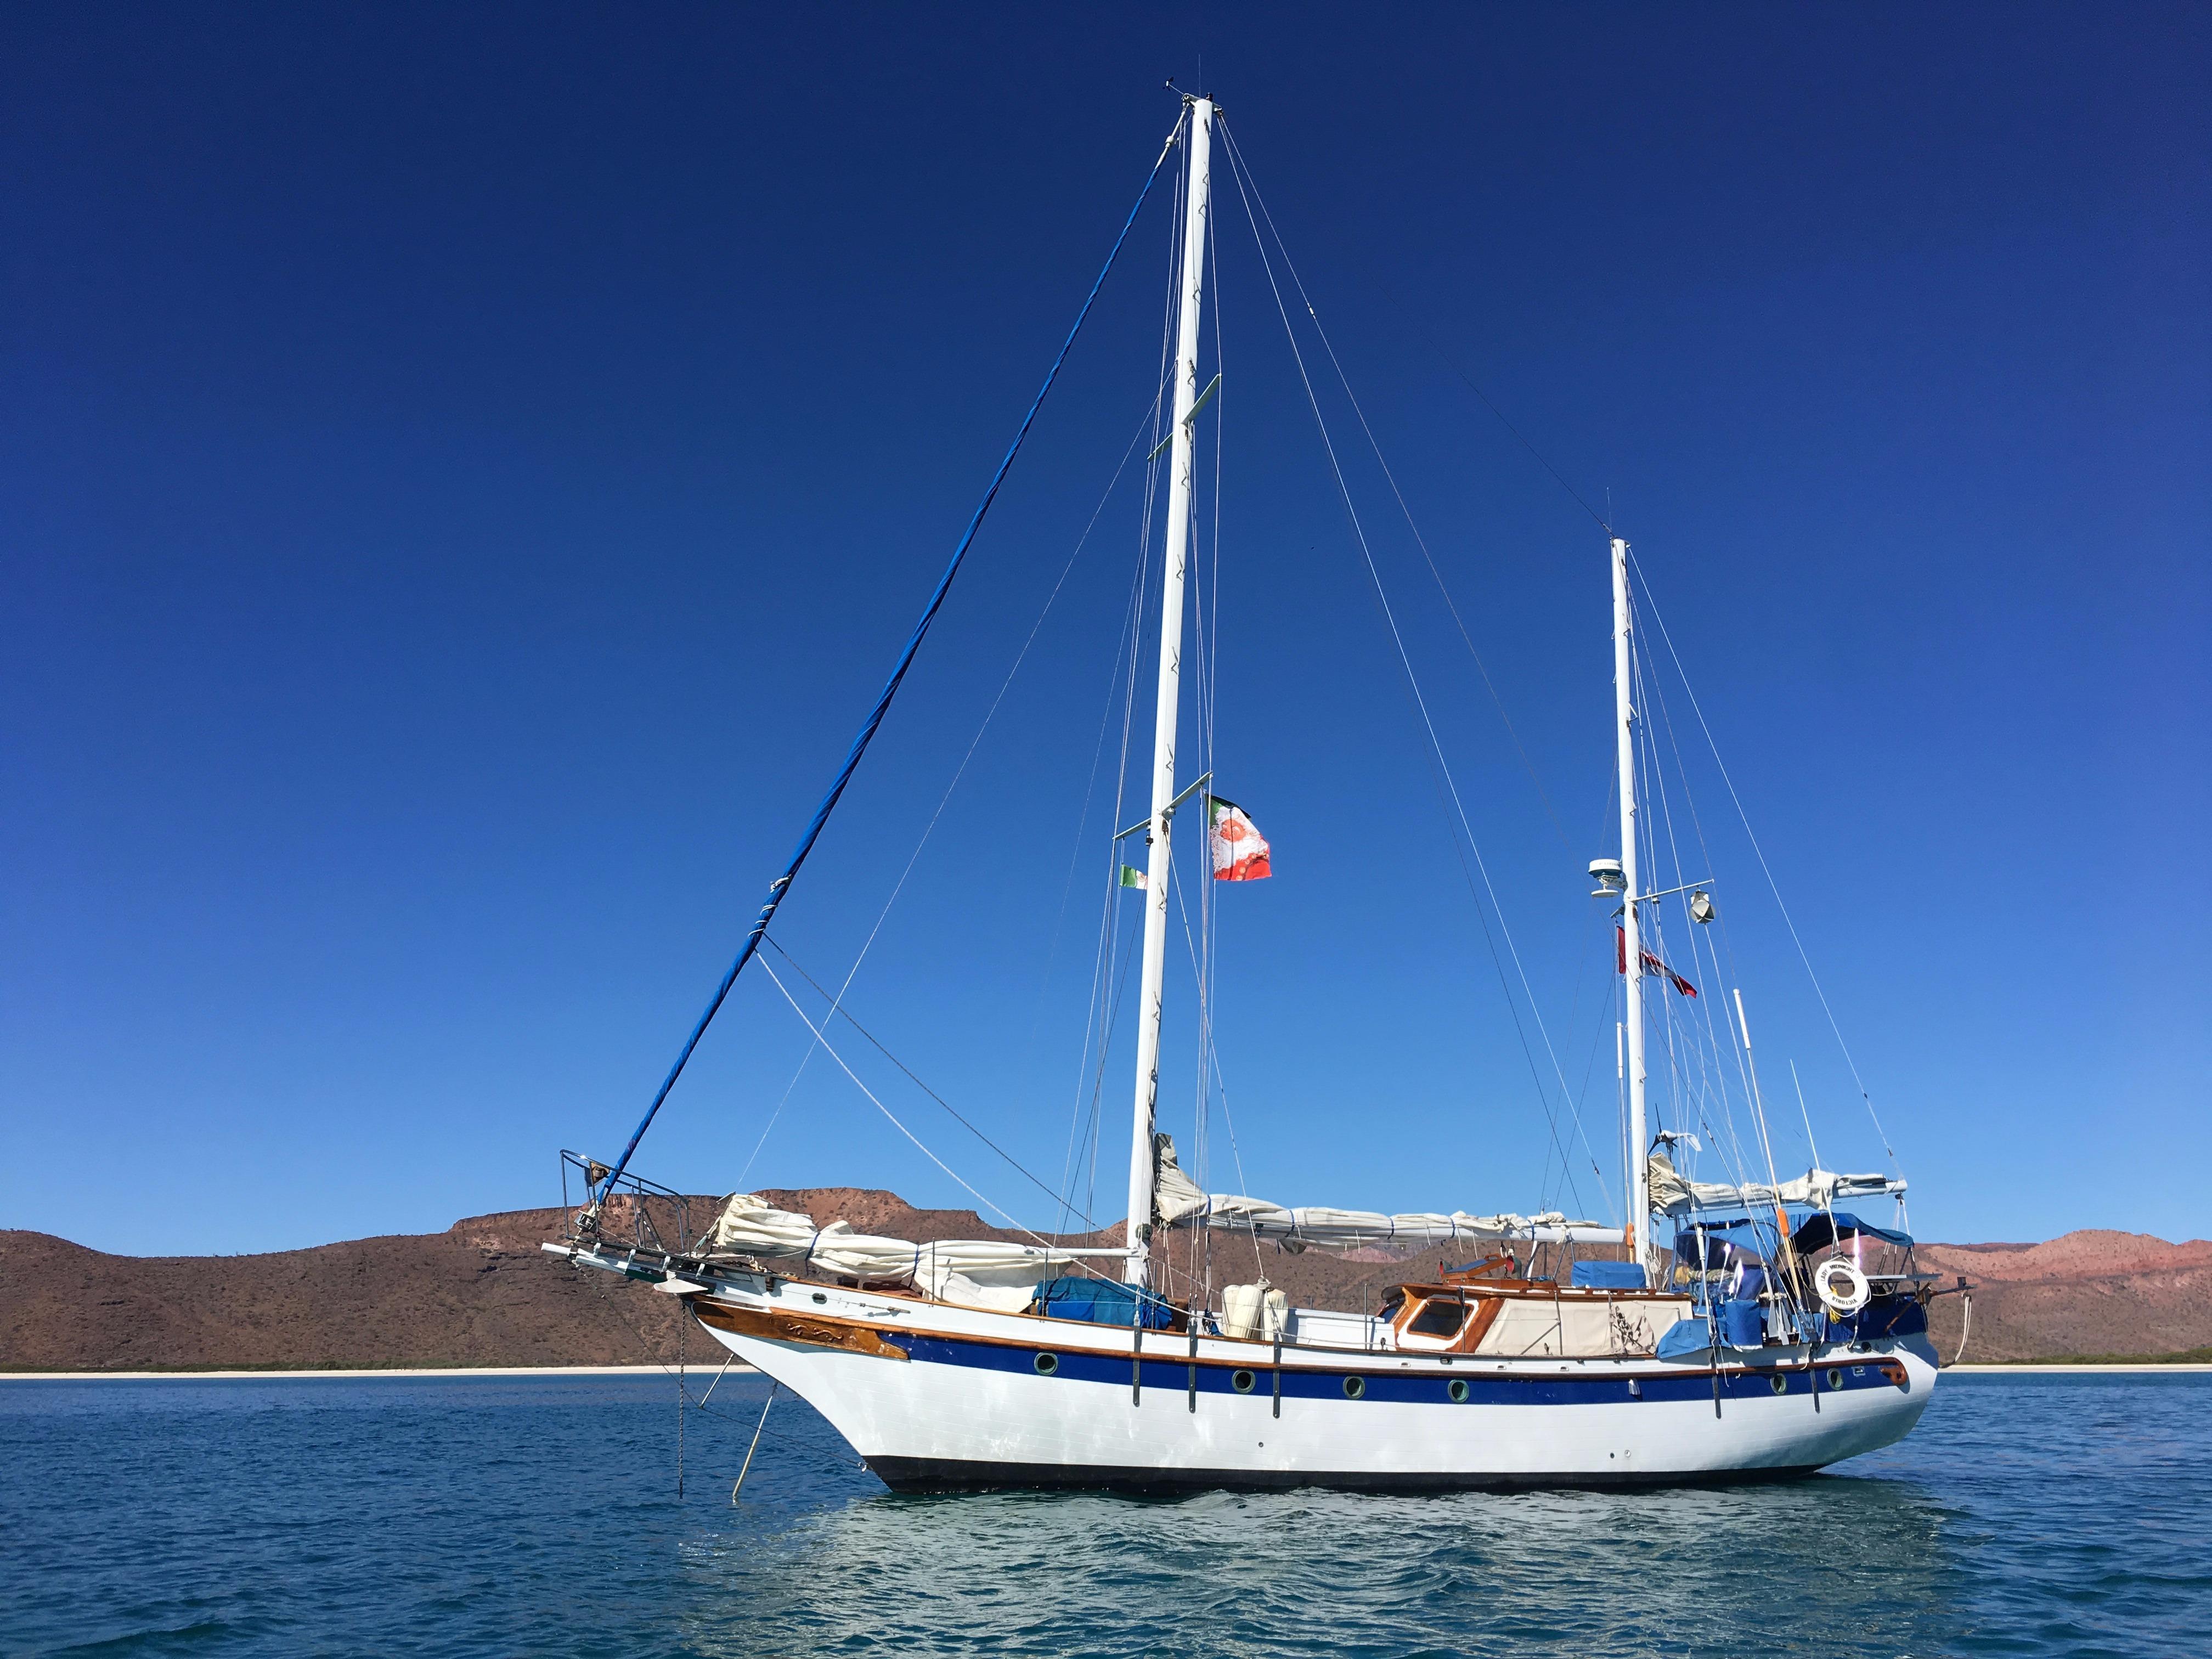 51' Formosa Island Trader Ketch+Boat for sale!